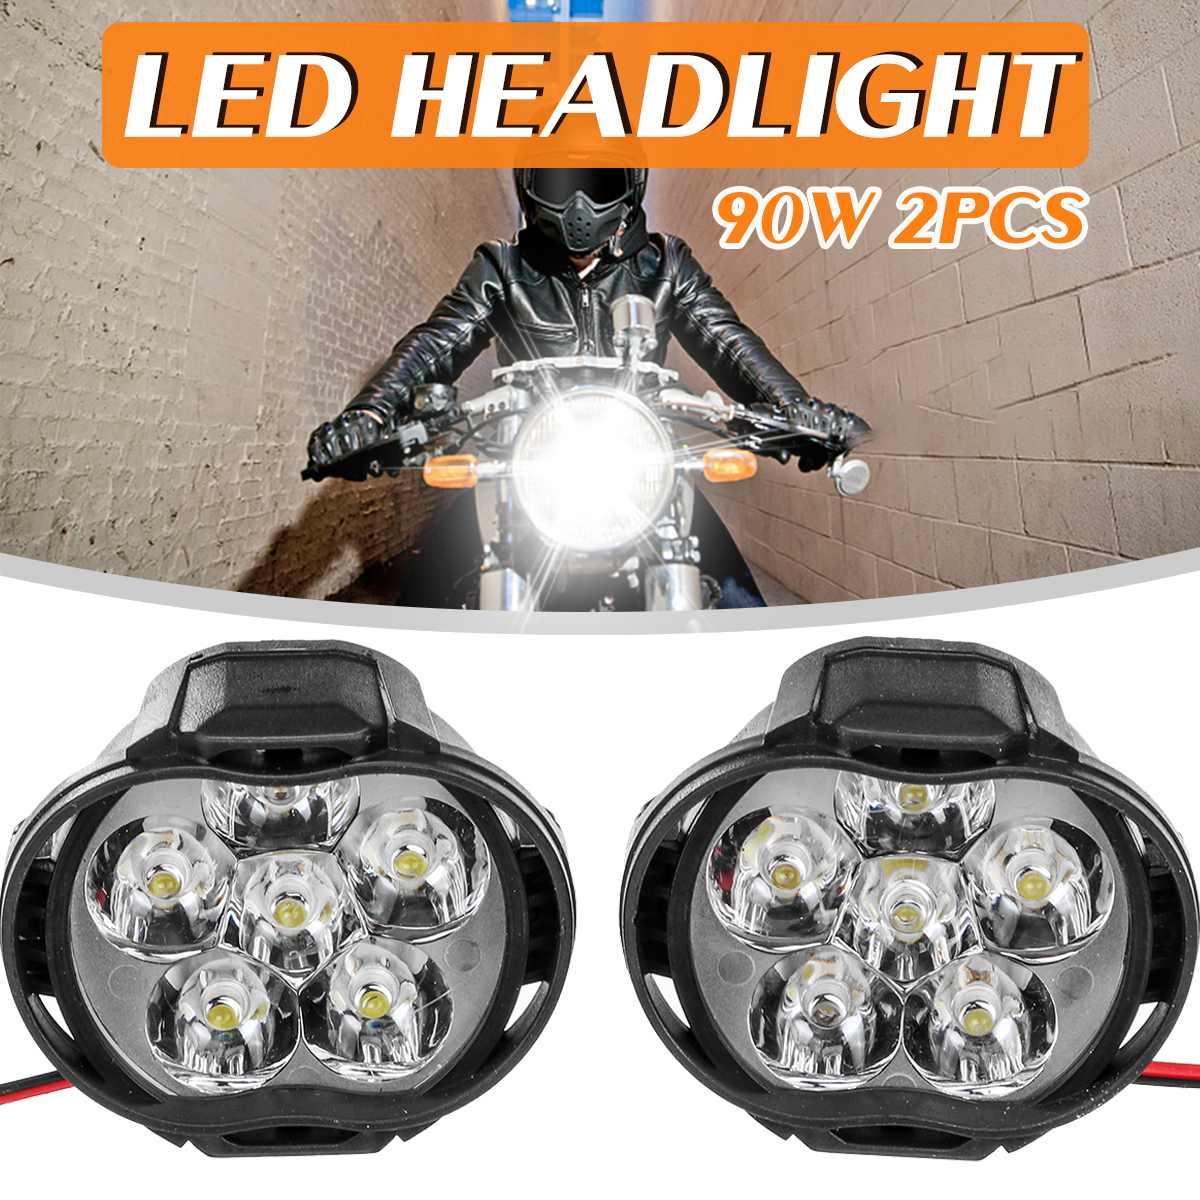 2pcs 4/6/9 LED Fog Spot Head Light Lamp 10W Black Motorcycle Headlights Motorbike Driving Fog Spot Ligh+ Switch 50000H Life